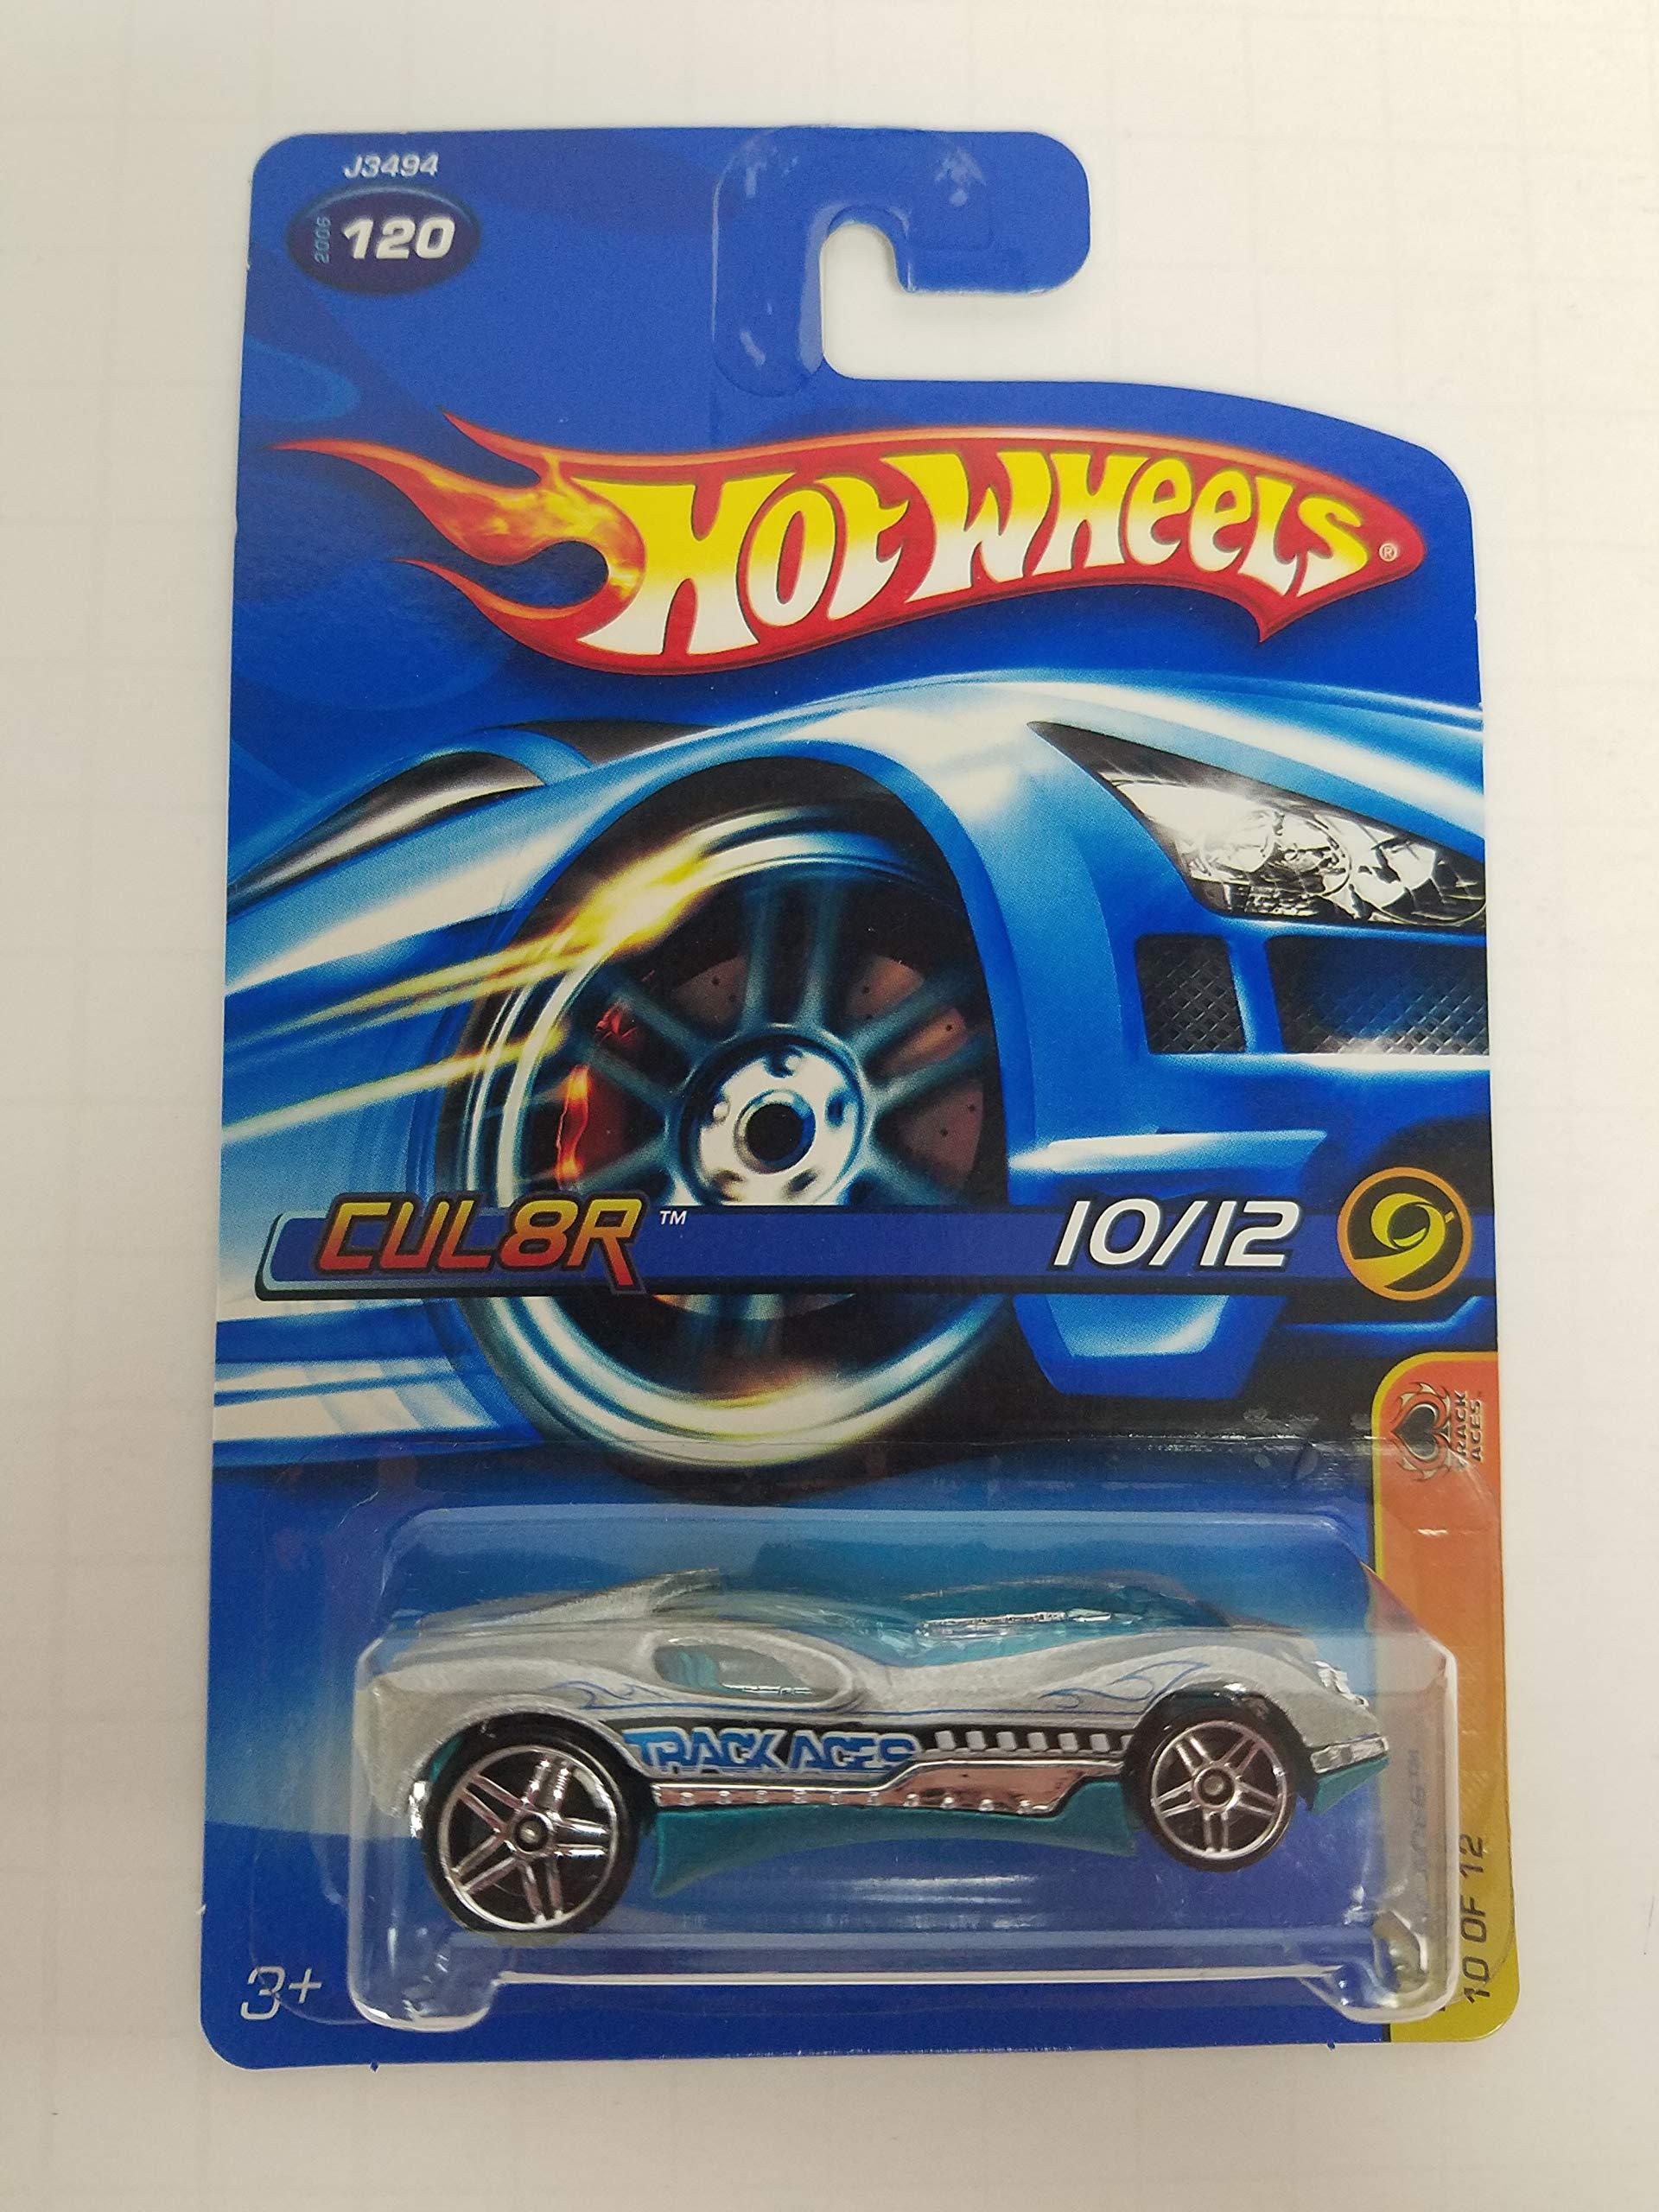 Cul8r Track Aces 10/12 No.120 Hot Wheels 2006 1/64 scale diecast car